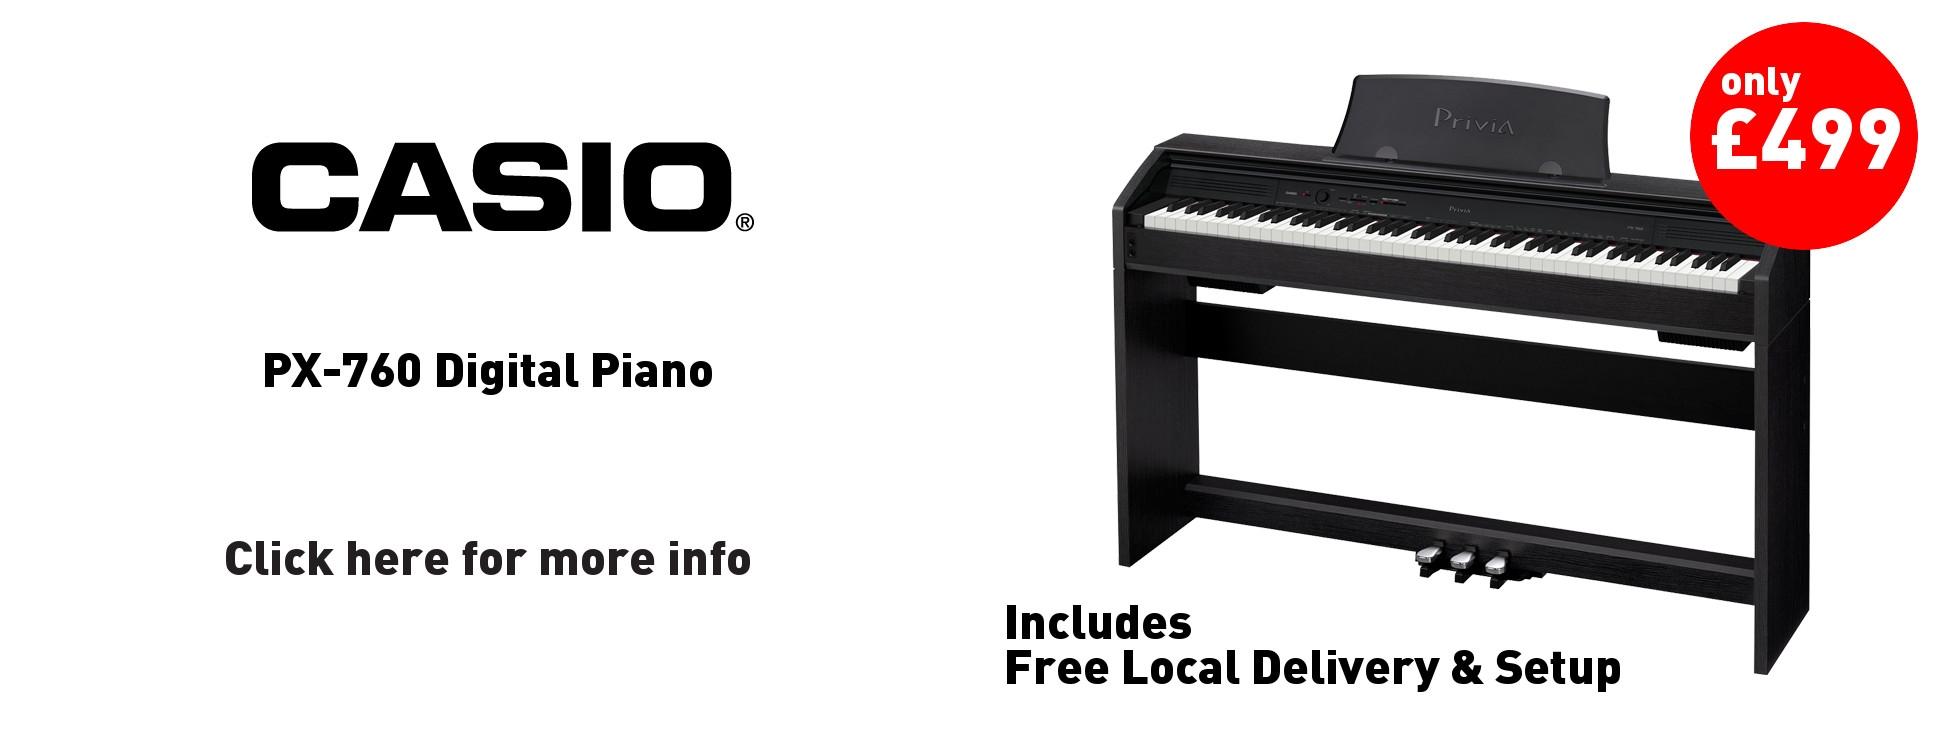 Casio PX-760 Digital Piano